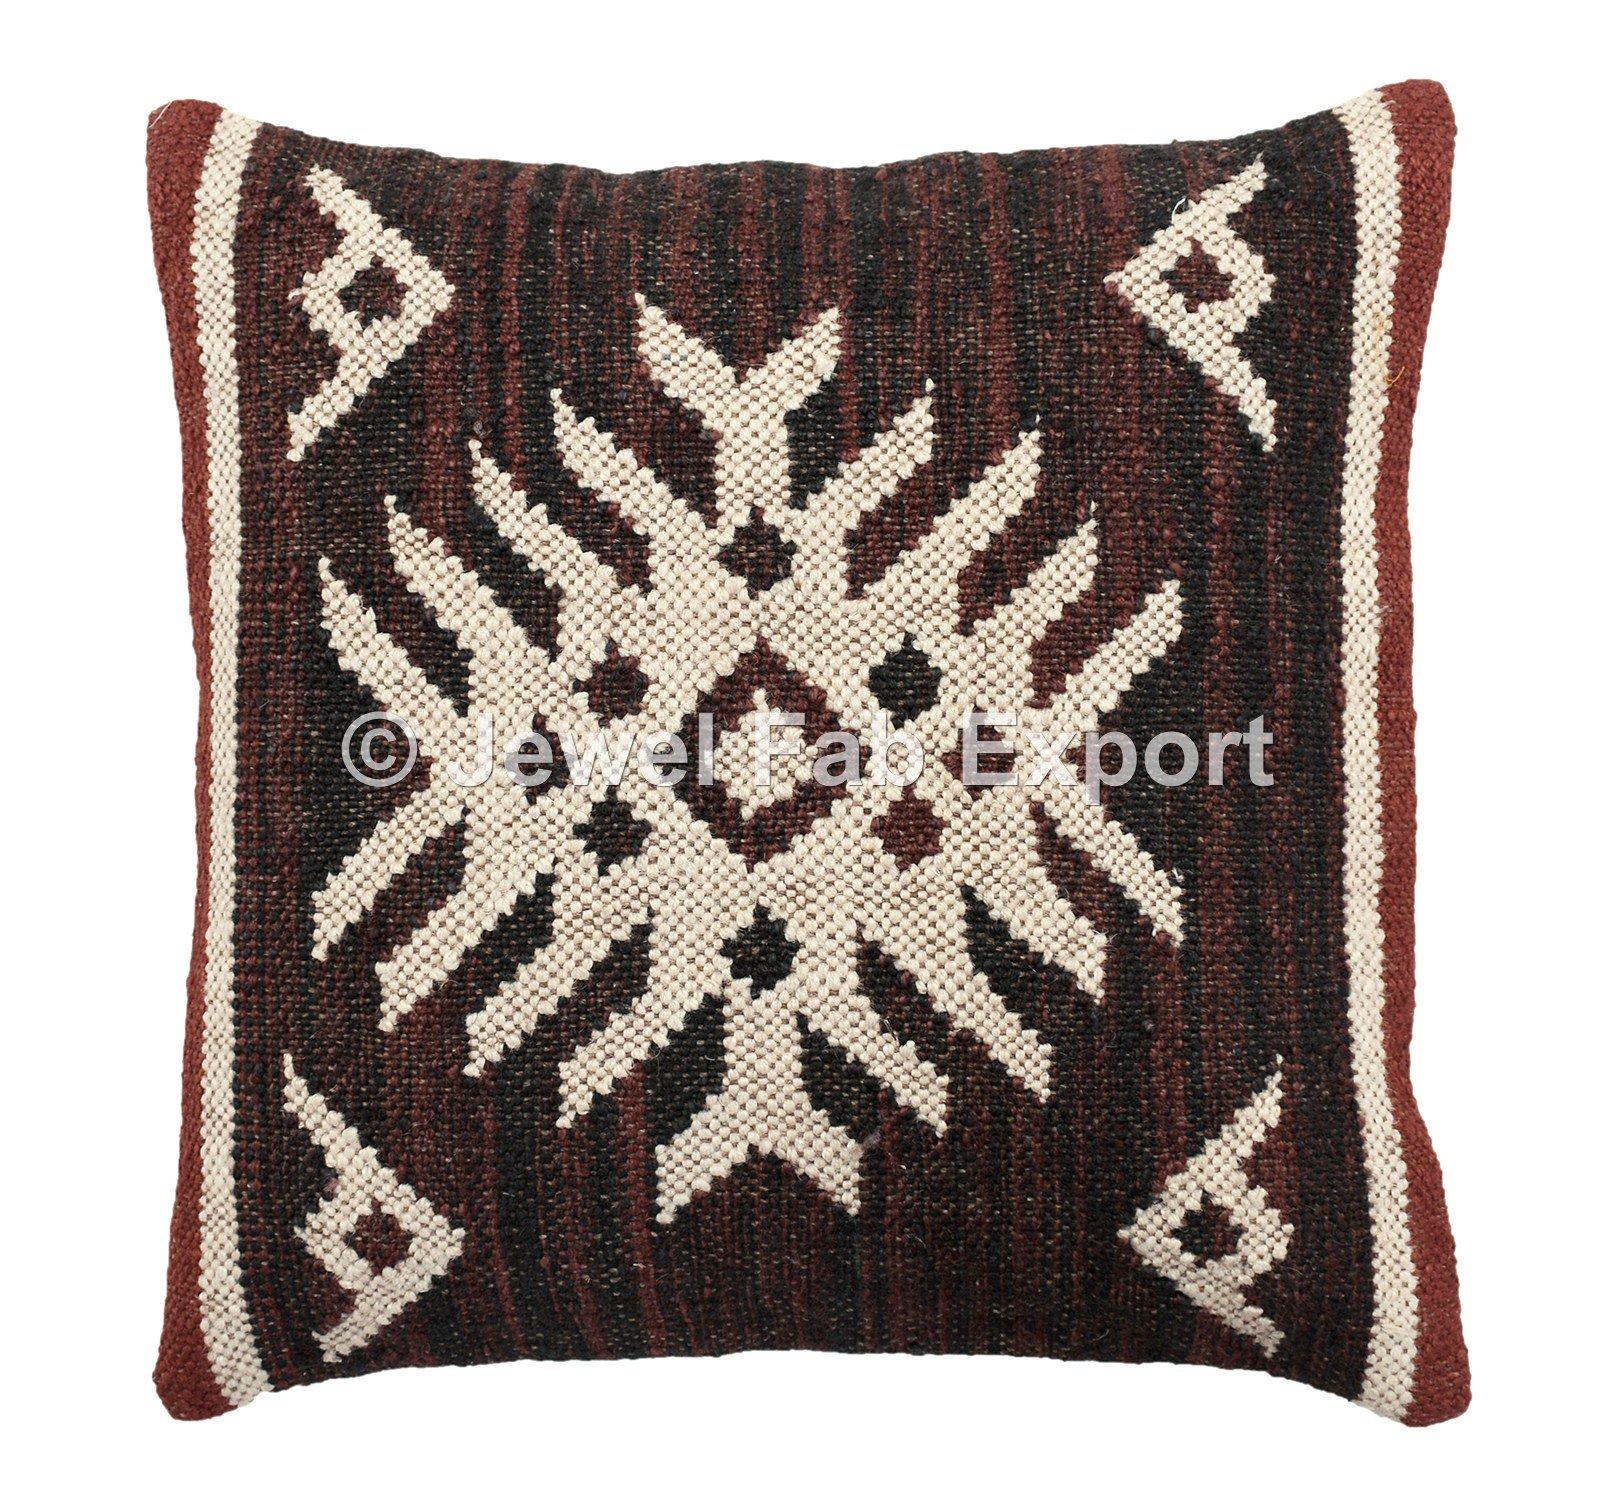 Set Of 5 Indian Decorative Jute Cushions,18x18'' Boho Pillow Shams, Handwoven Jute Rug Pillow Throw Cushions ,Kilim Cushion Cover For Living Room Brown Jute Kilim